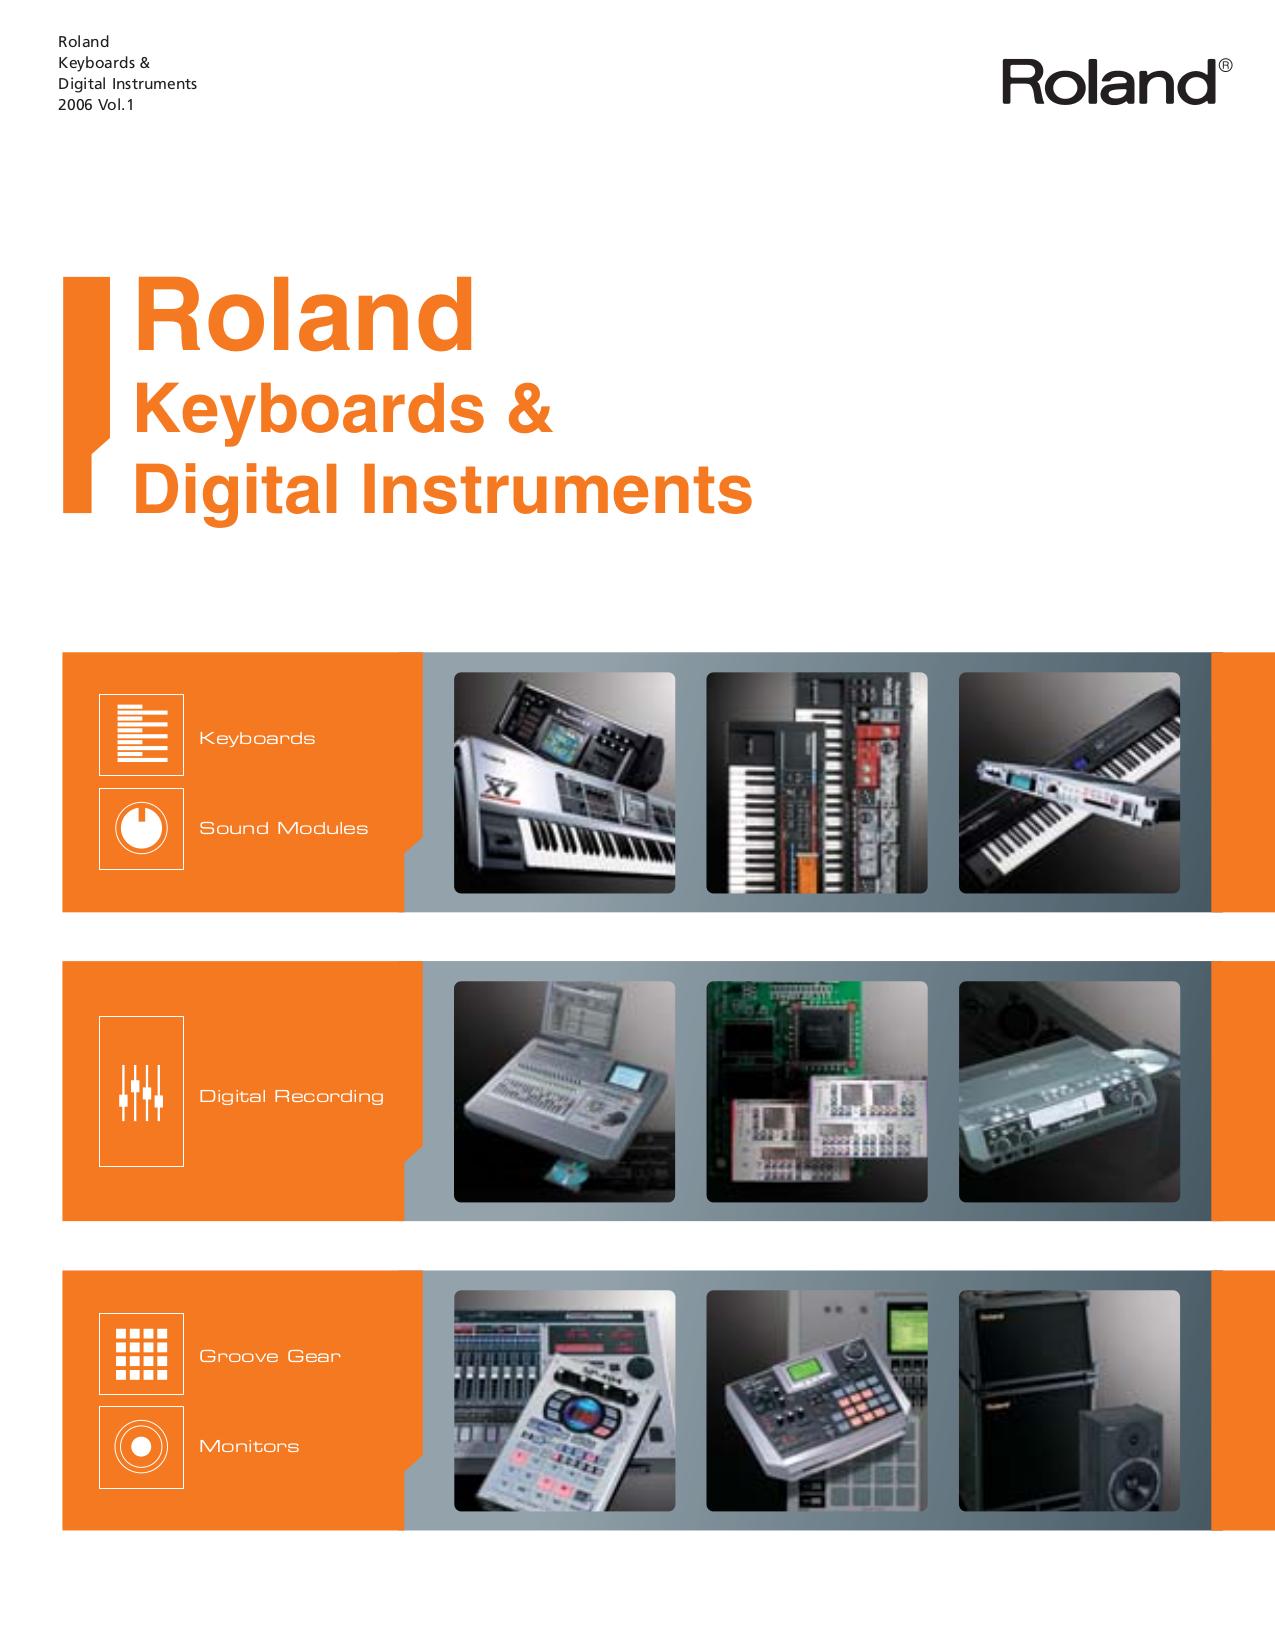 Download free pdf for Roland GW-7 Music Keyboard manual